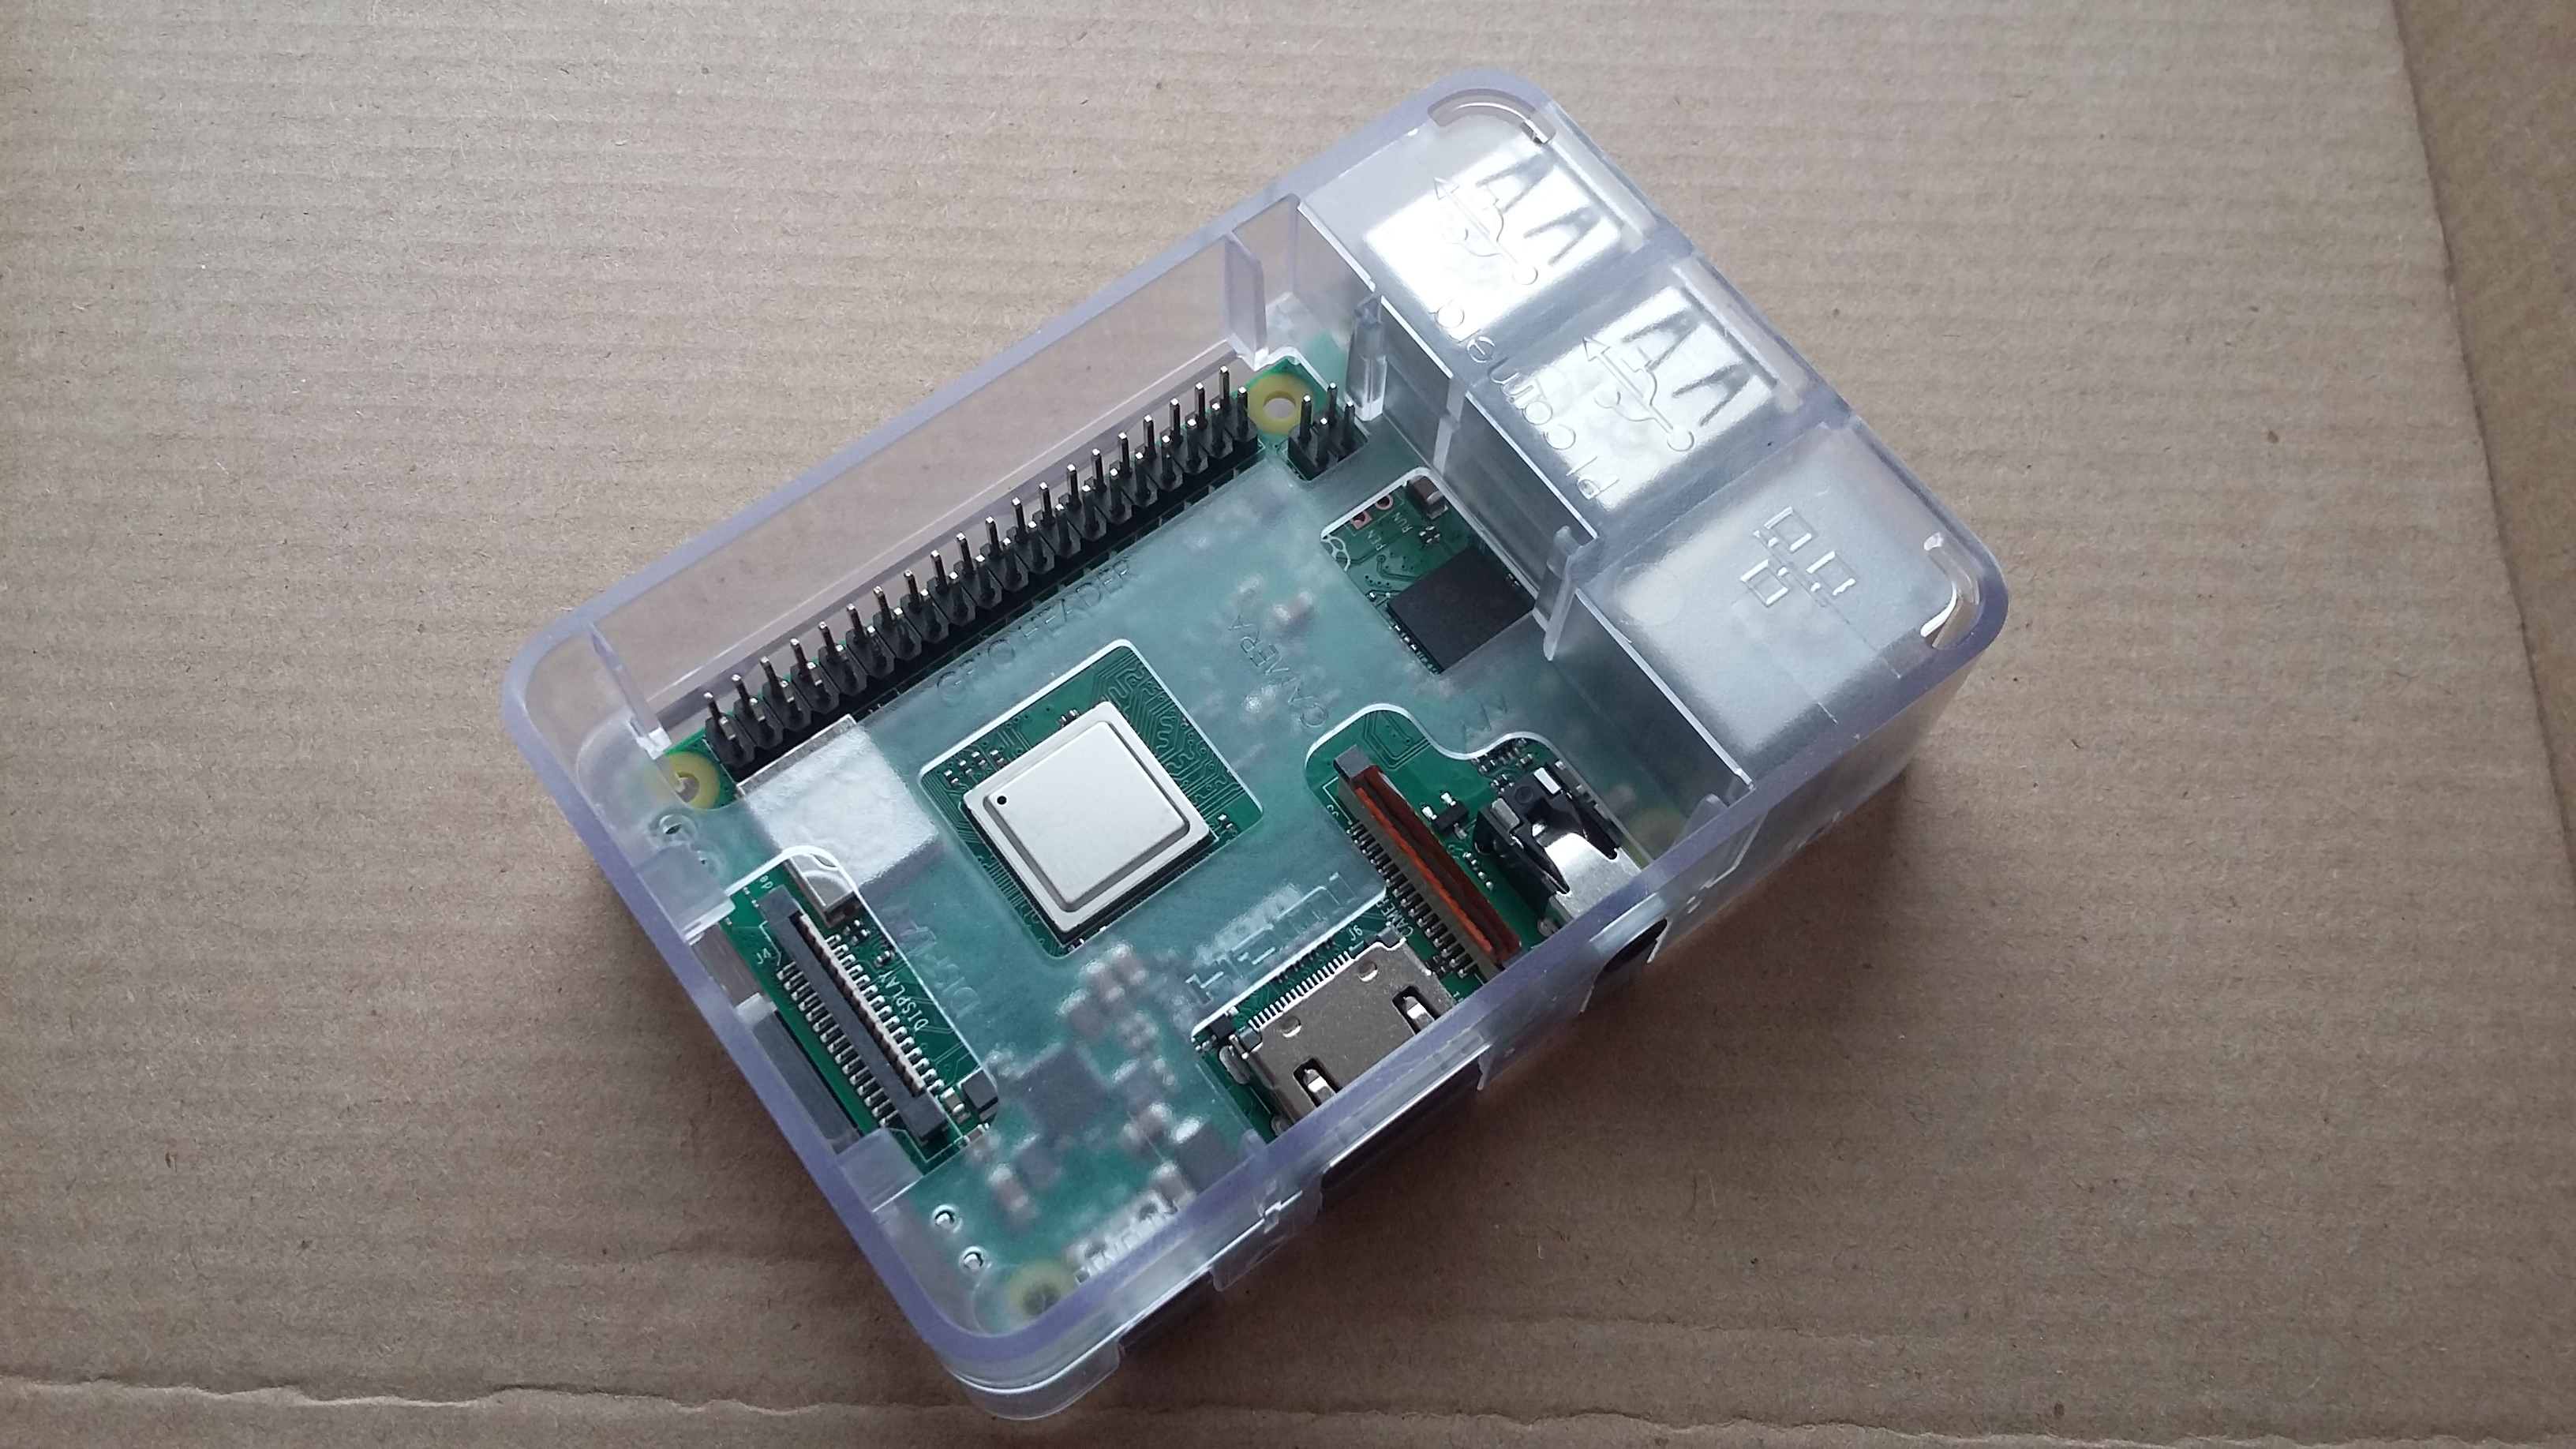 Raspberry Pi 3 B+ in transluscent plastic case